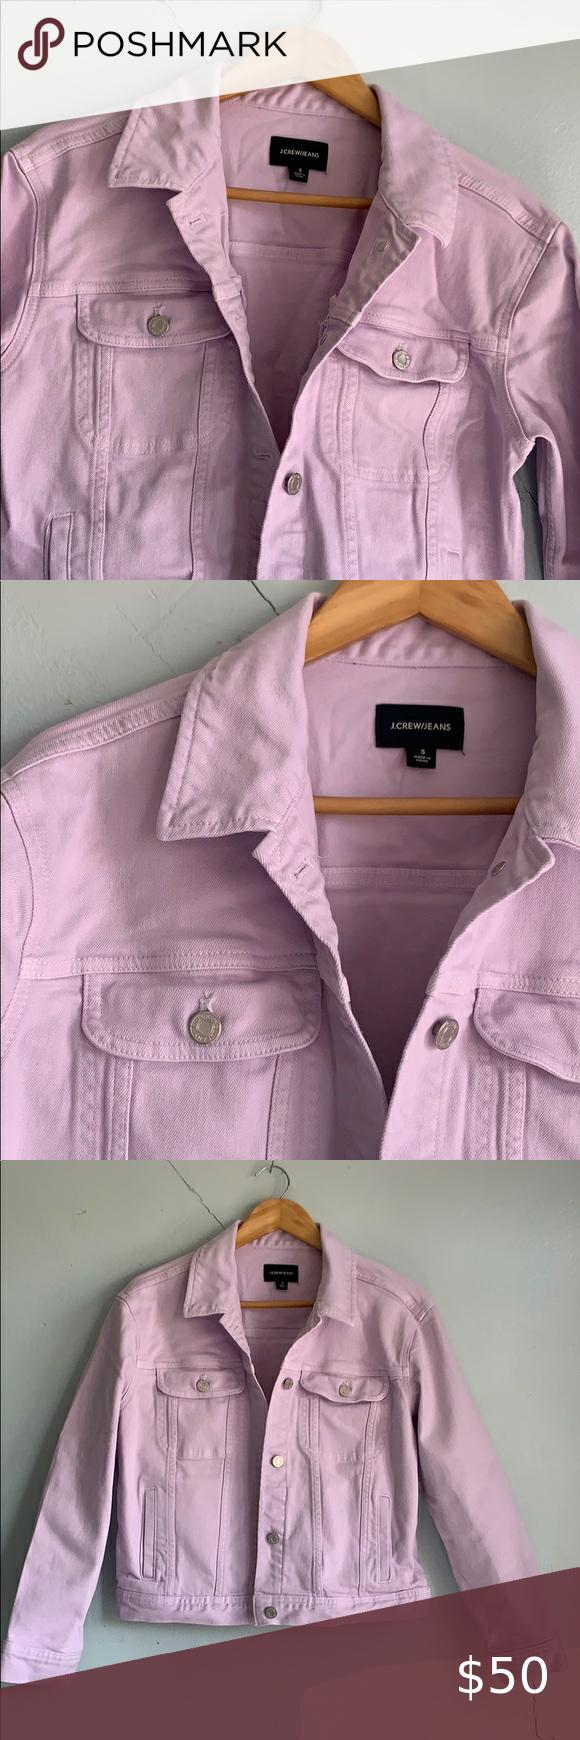 J Crew Lavender Denim Jacket 1st Measurement 21 1 2 2nd Measurement 19 Excellent Condition Like New J Crew Jacket In 2020 Jean Coat Denim Jacket Clothes Design [ 1740 x 580 Pixel ]